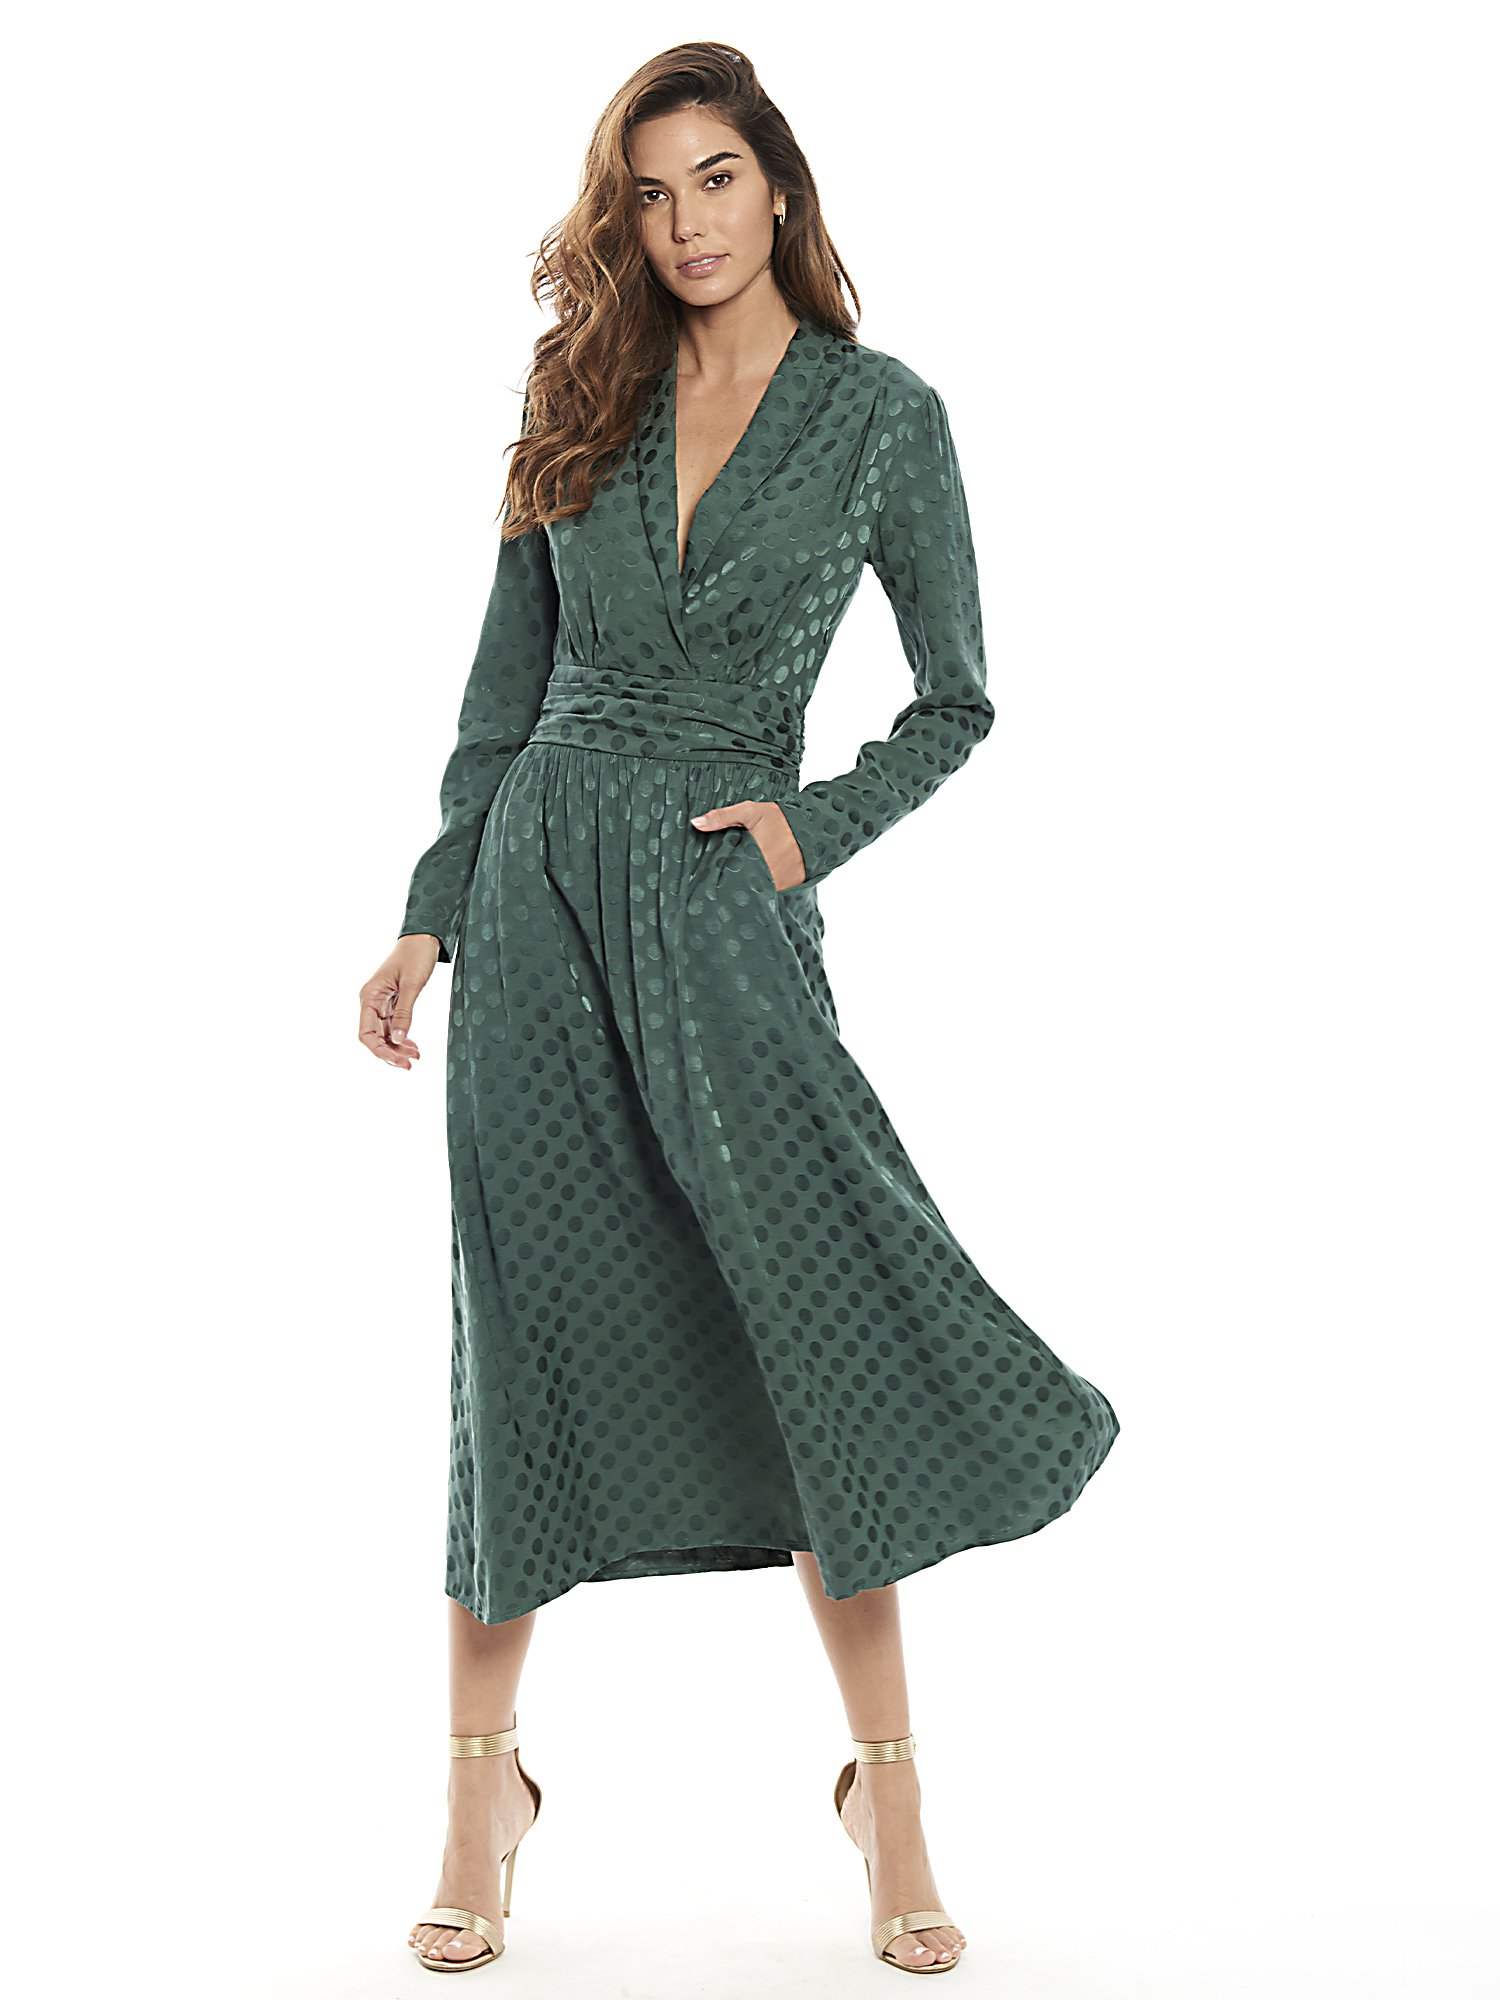 Celeste-Midi-Dress_08810241_352.jpg